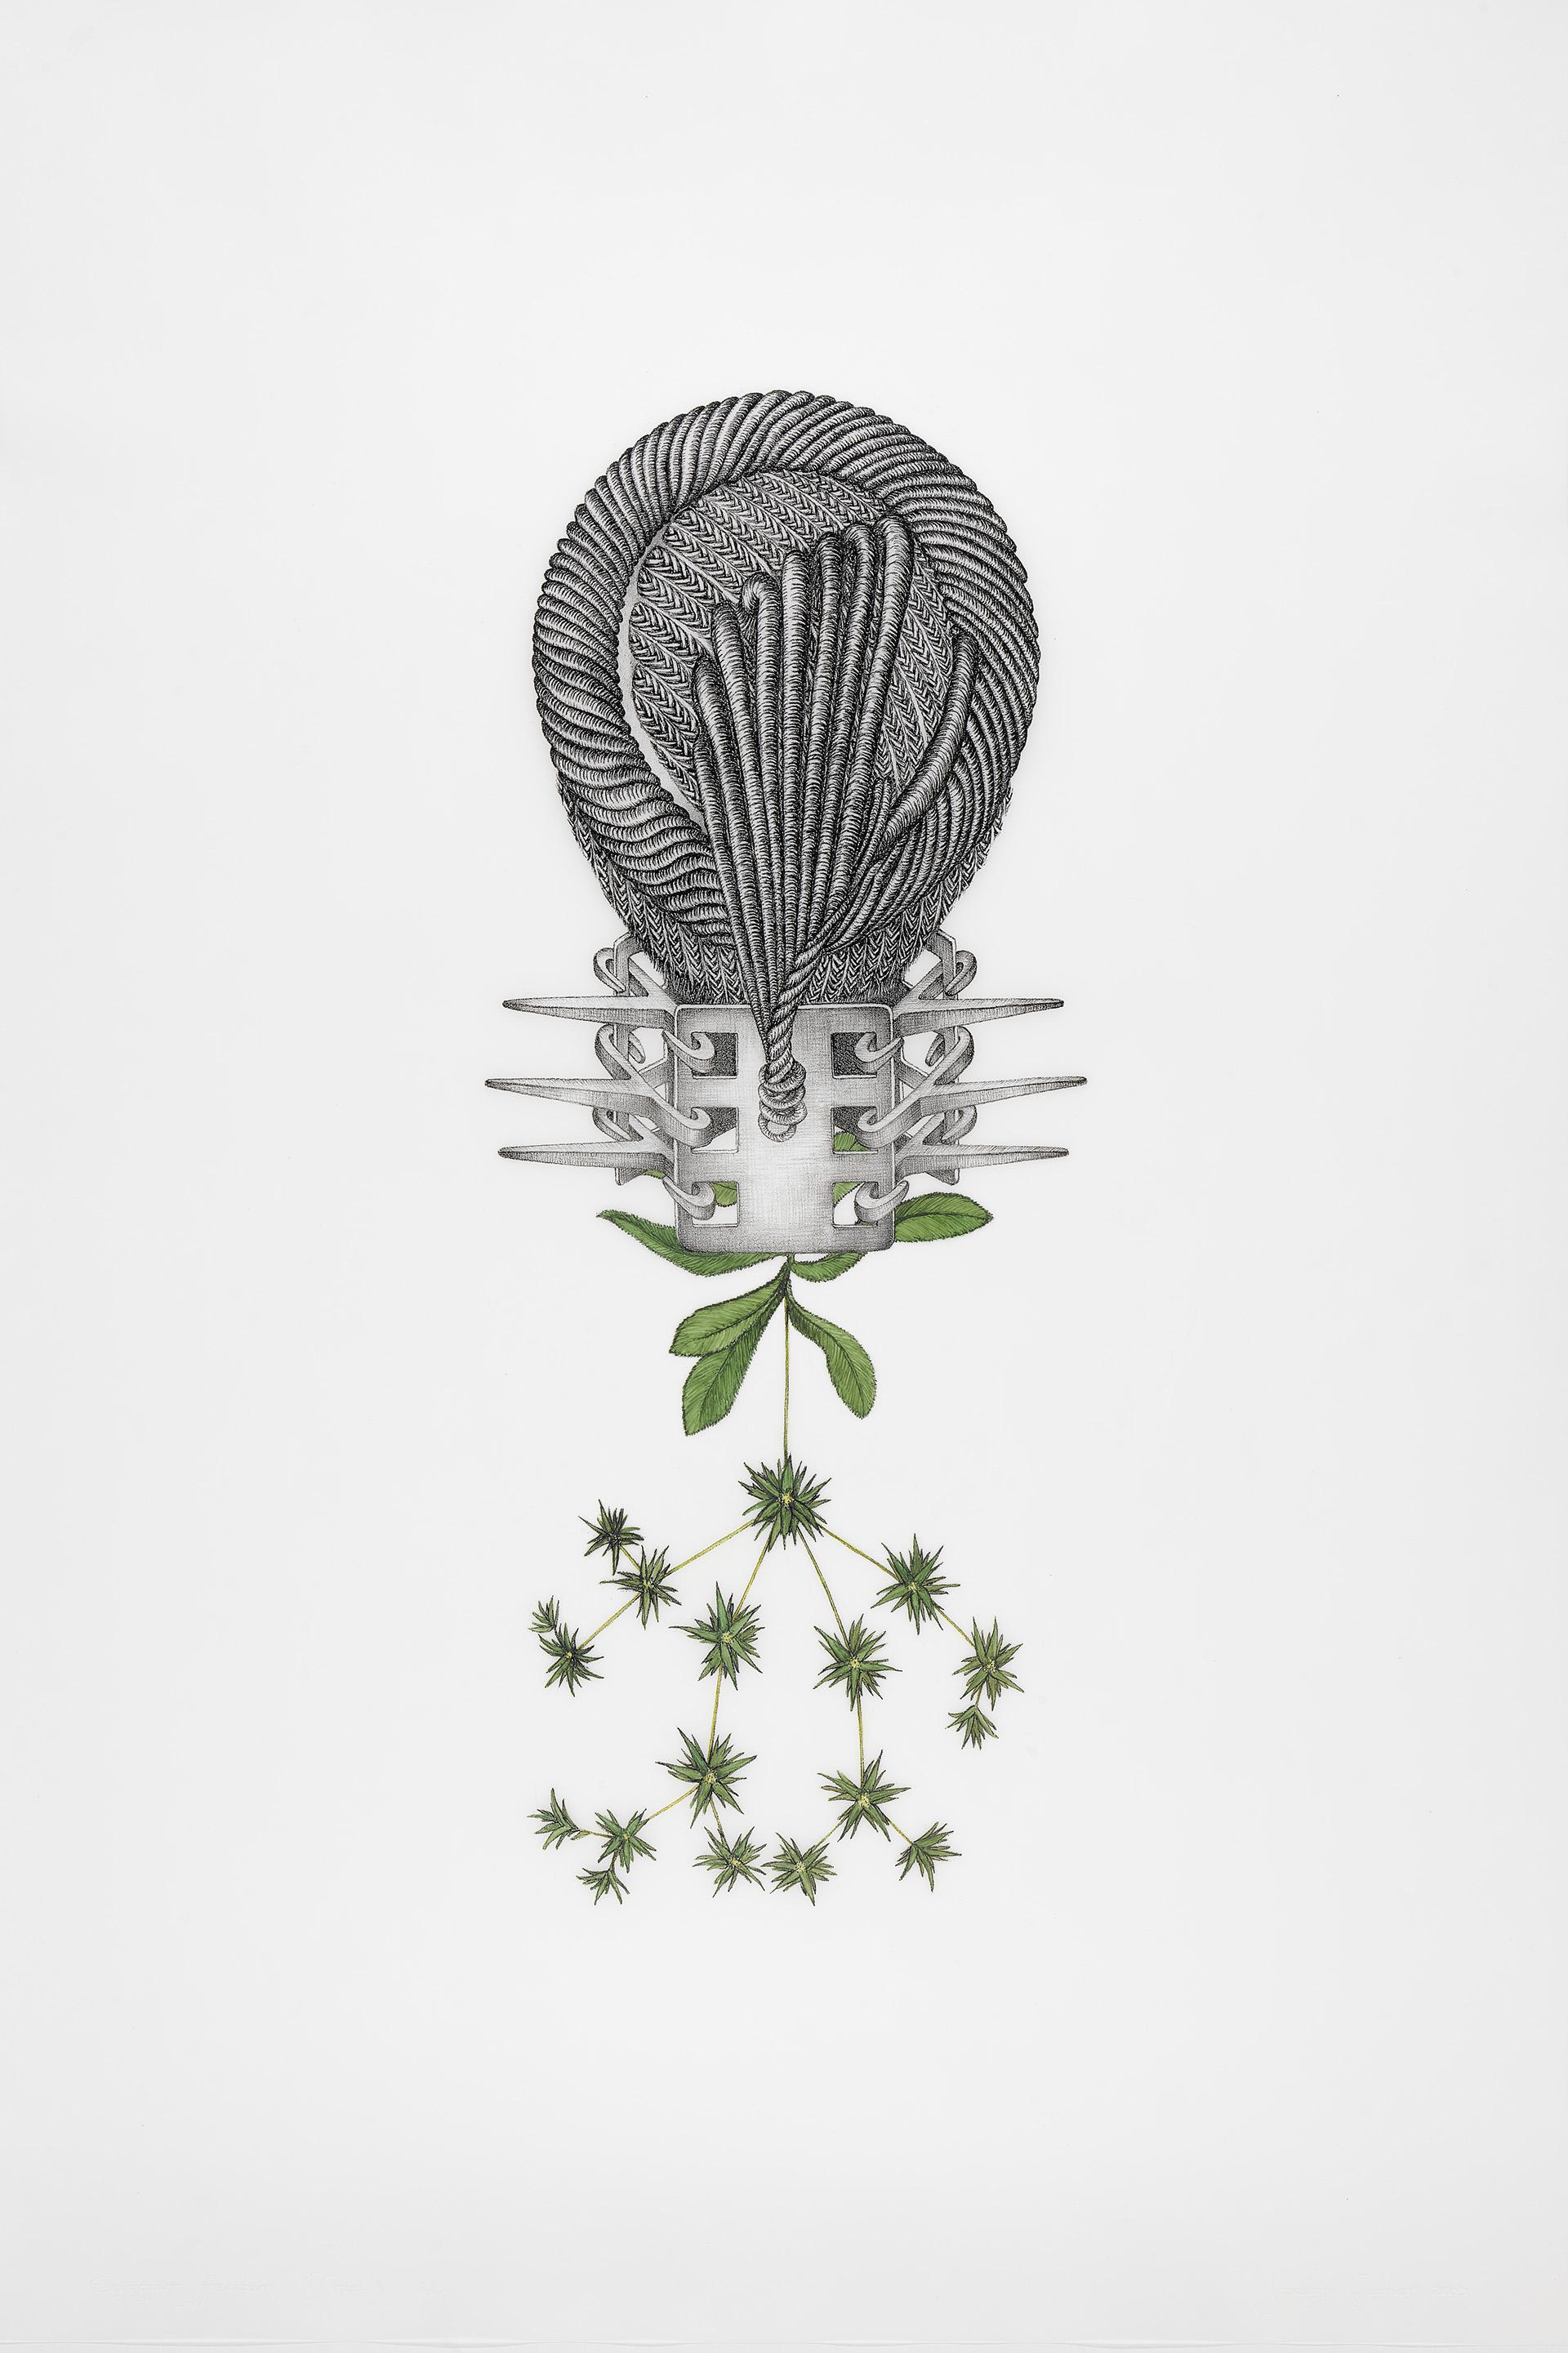 Joscelyn Gardner, Eryngium foetidum (Prue), 2009, hand-colored lithograph on frosted mylar, Yale Center for British Art, Friends of British Art Fund, © Joscelyn Gardner